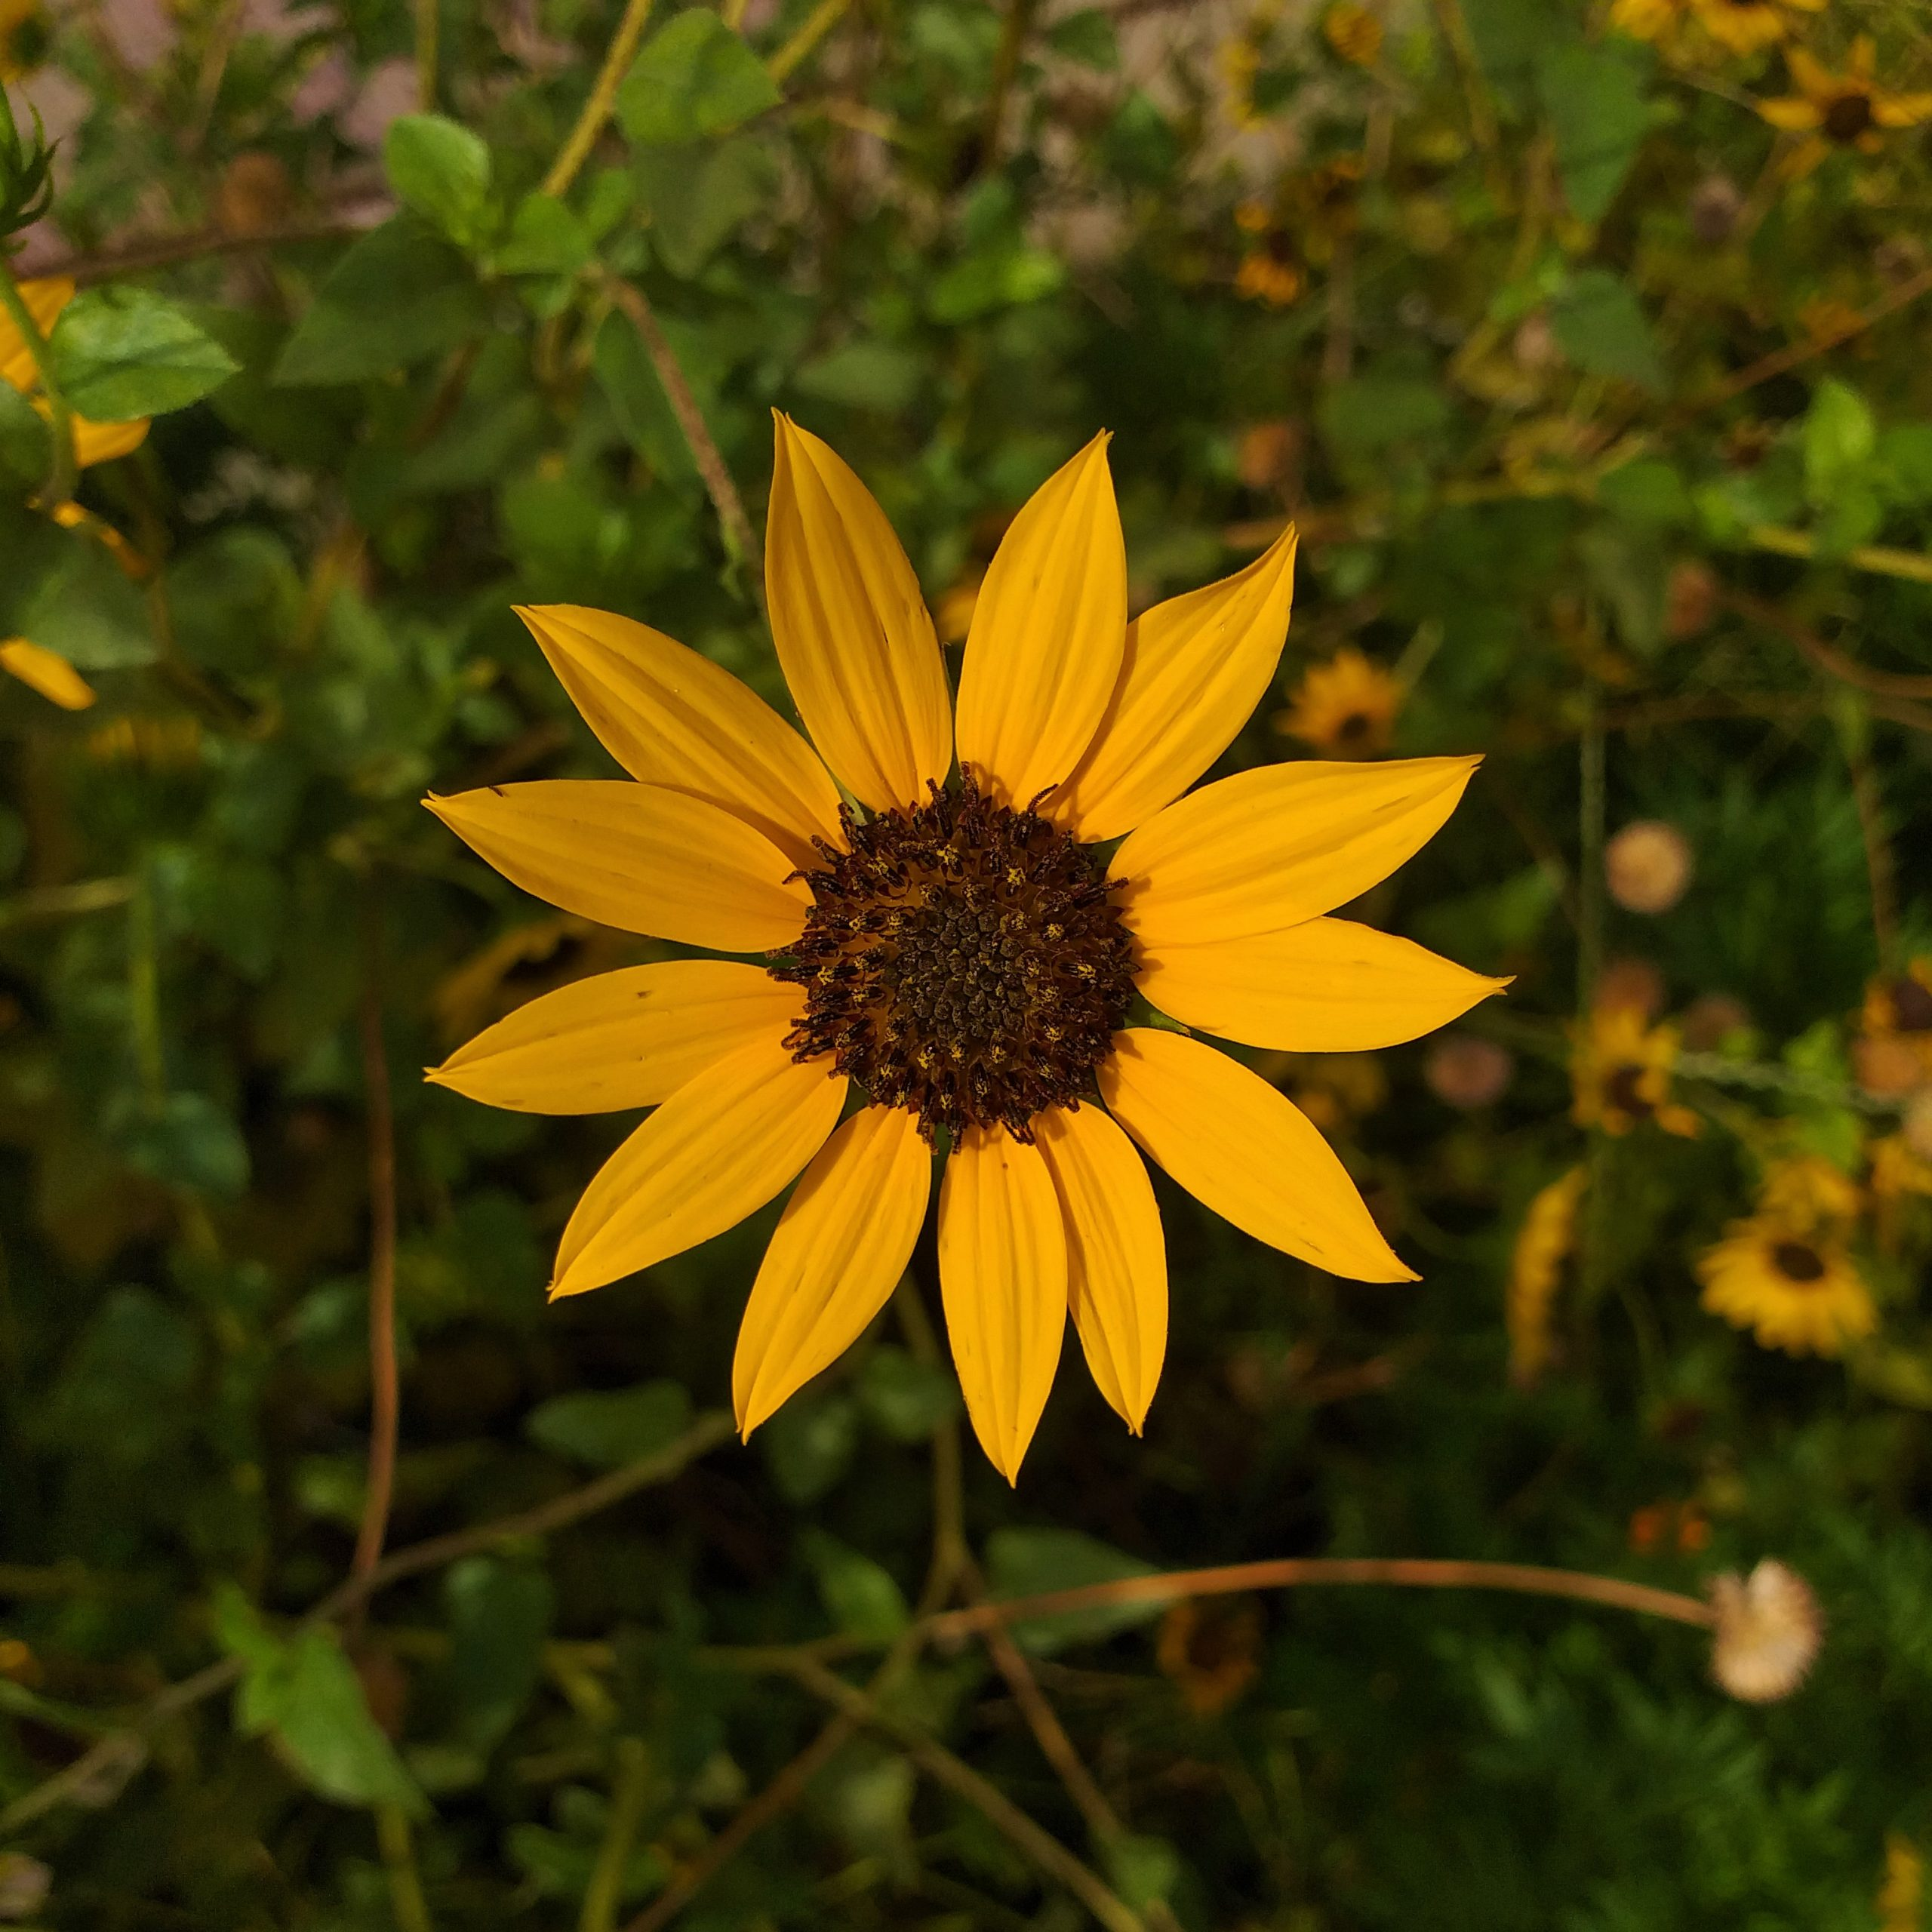 Sunflower on Focus